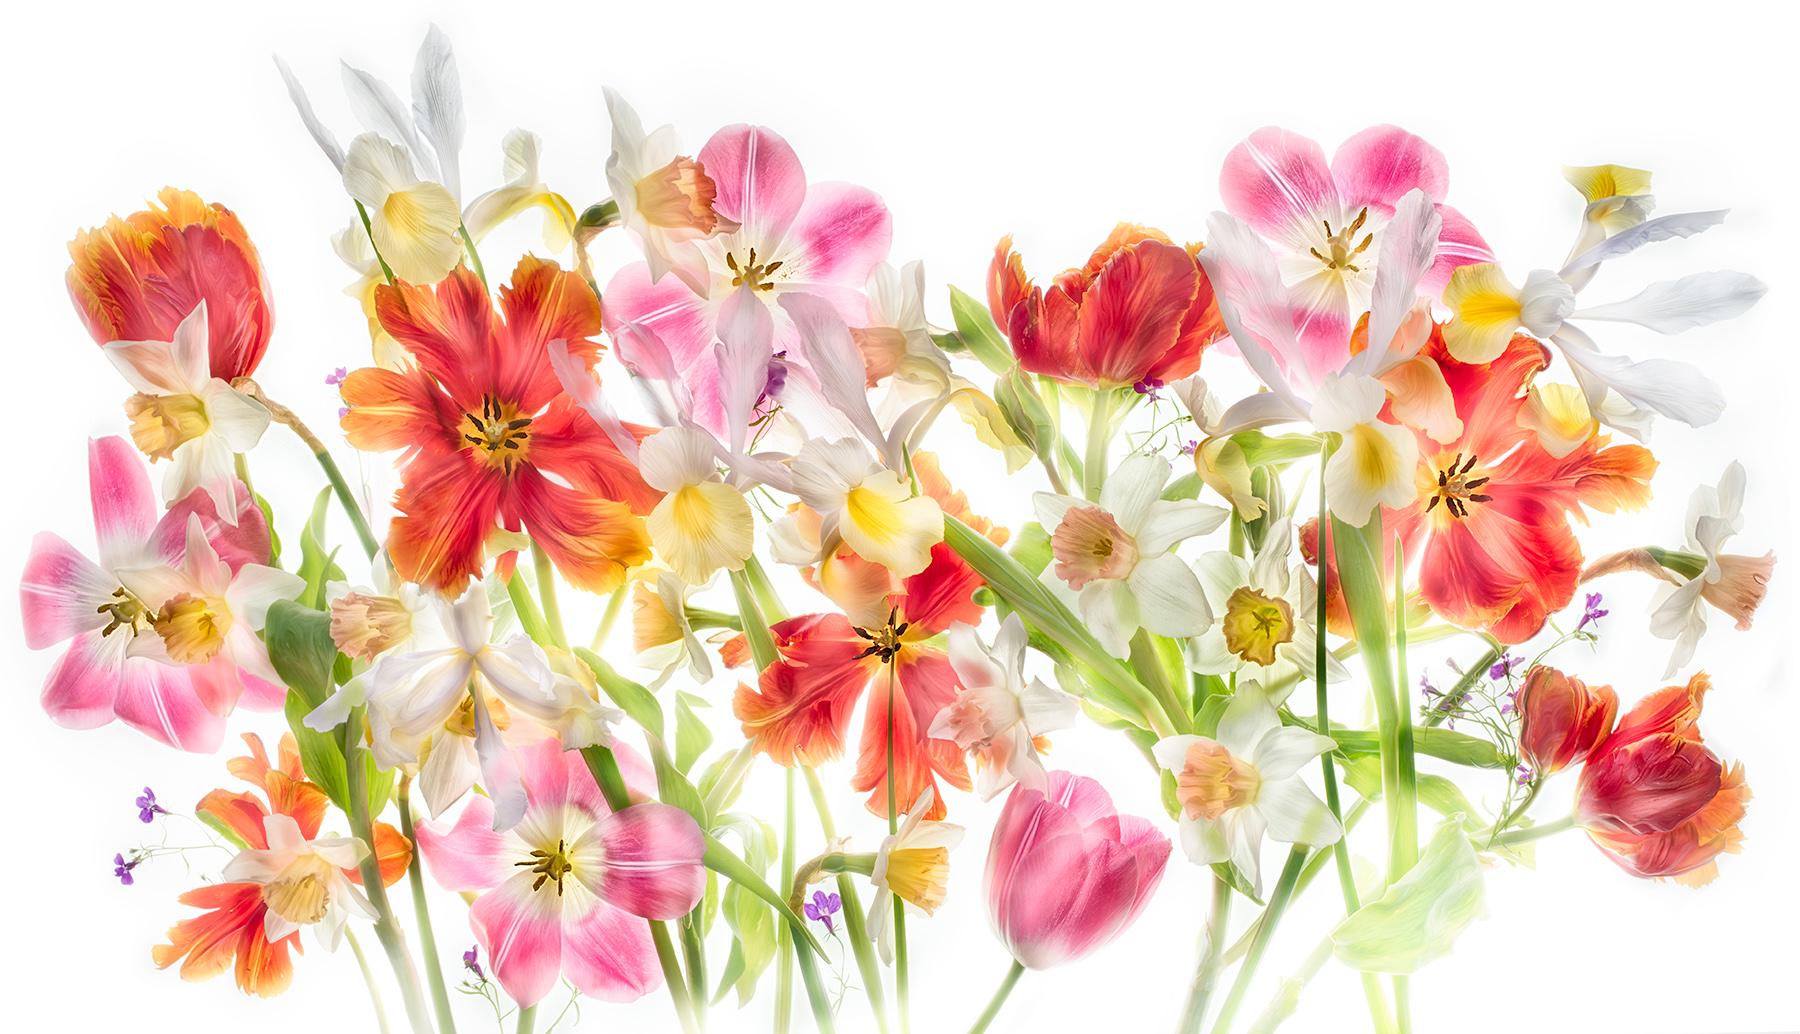 Flowers of Spring's Desire © Harold Davis